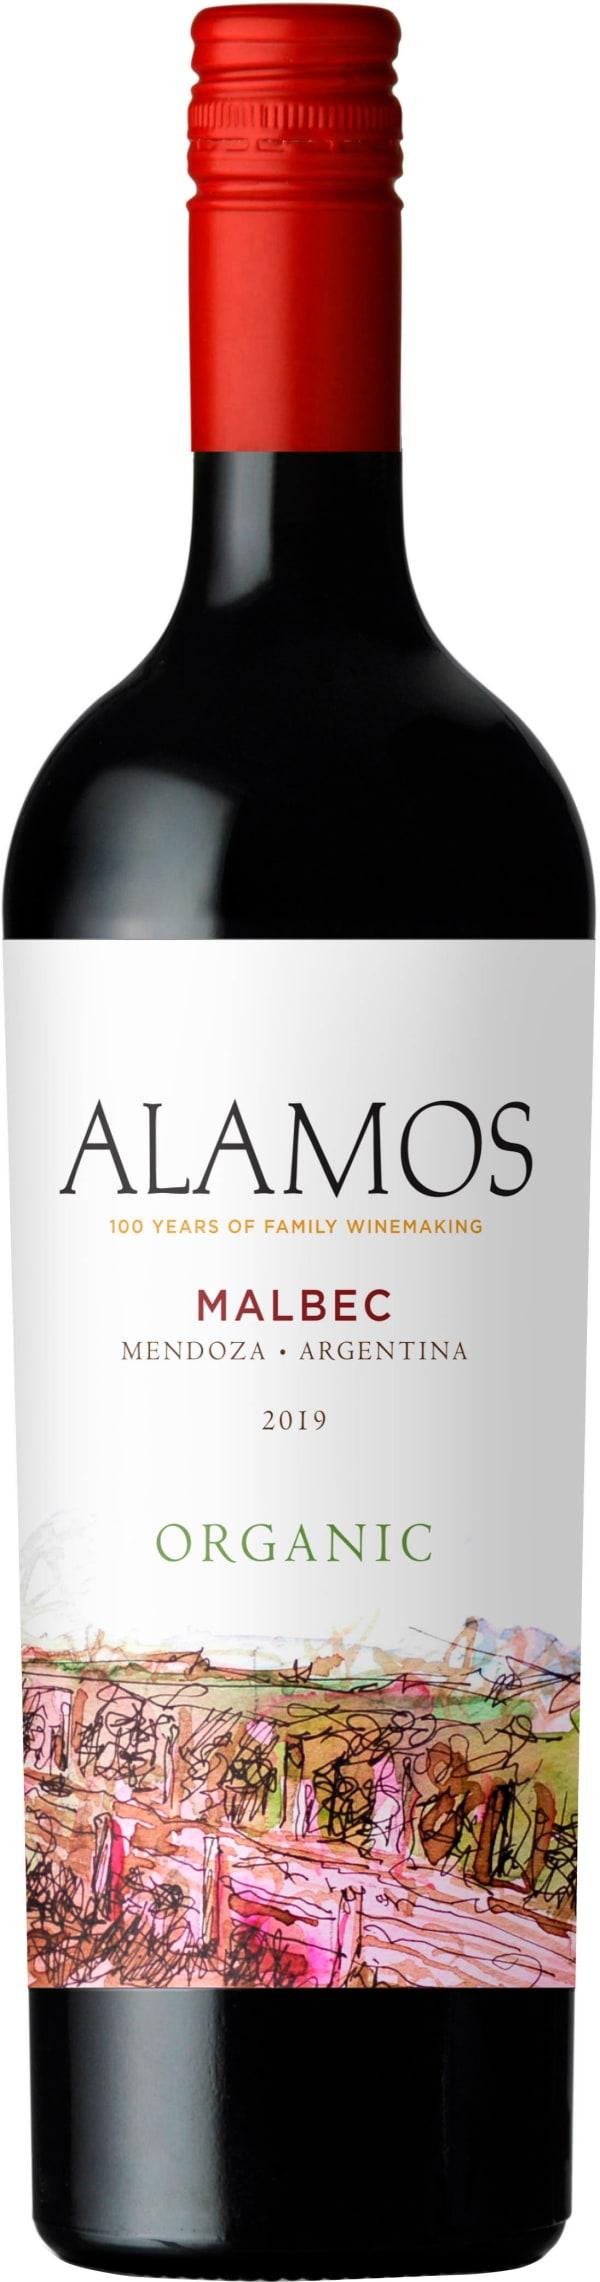 Alamos Malbec 2017